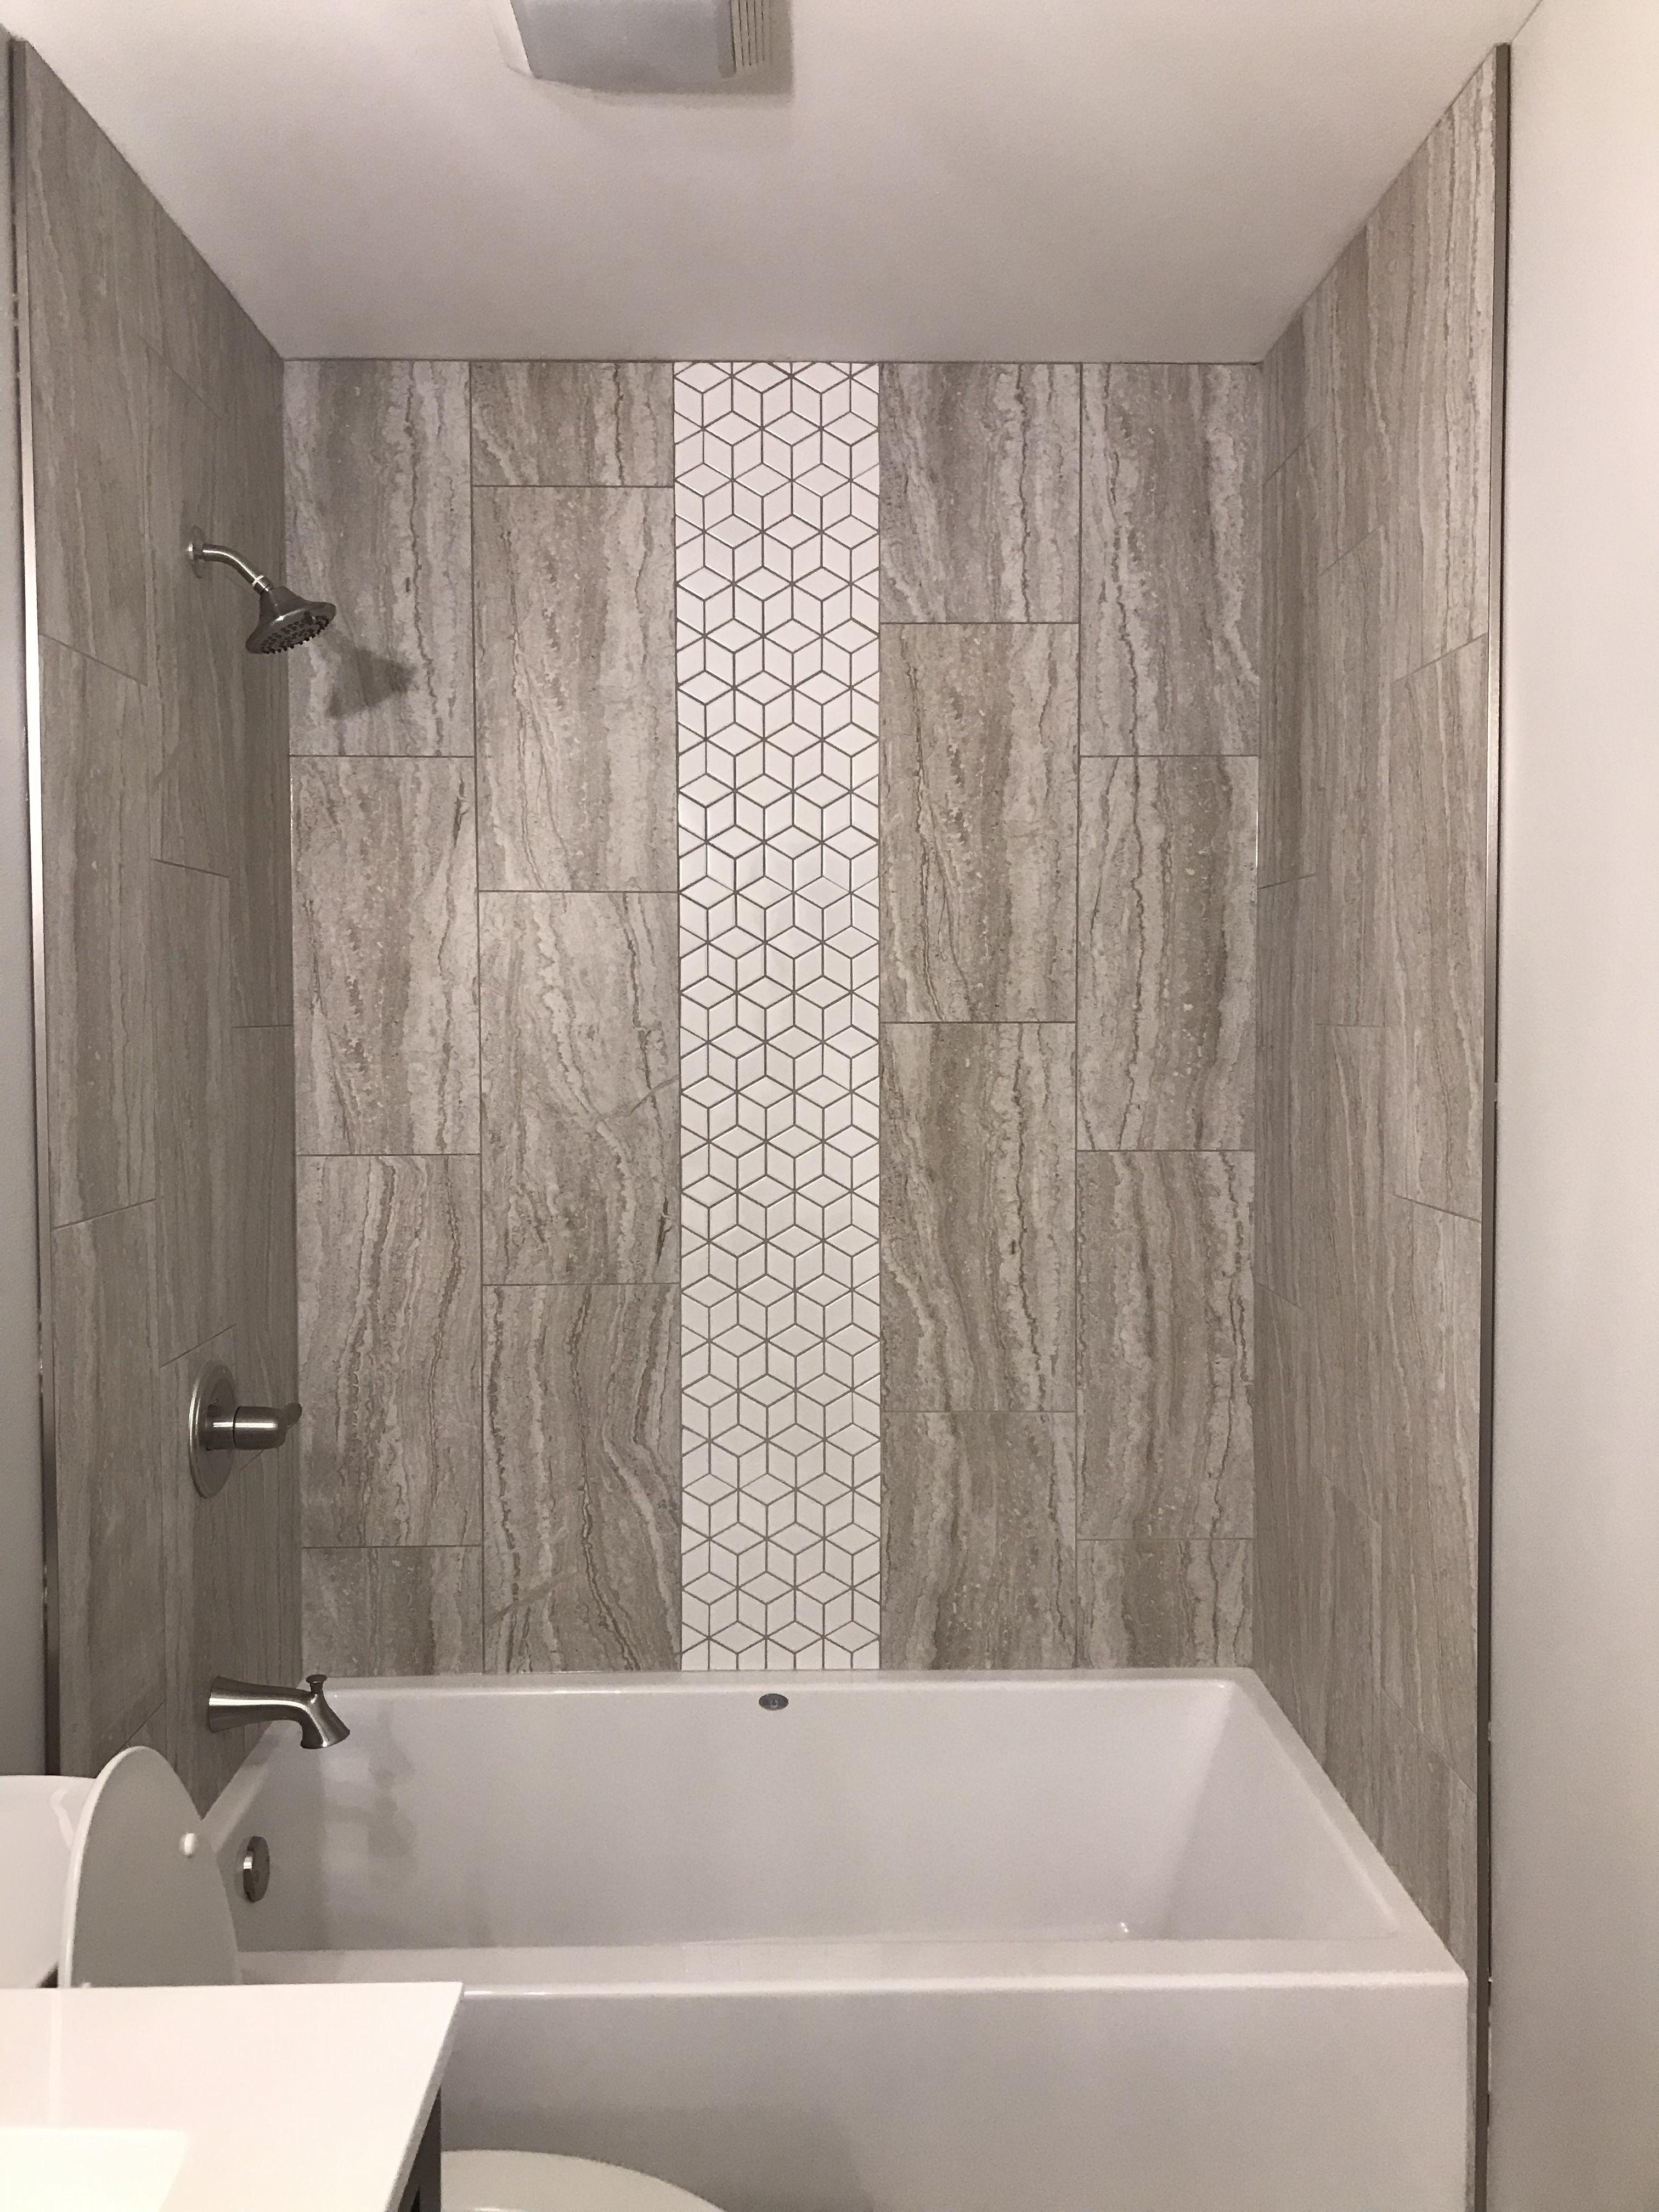 Custom Tile Tub Shower Surround With White Rhombus Tile Mosaic Accent Shower Surround Shower Tub Rhombus Tile